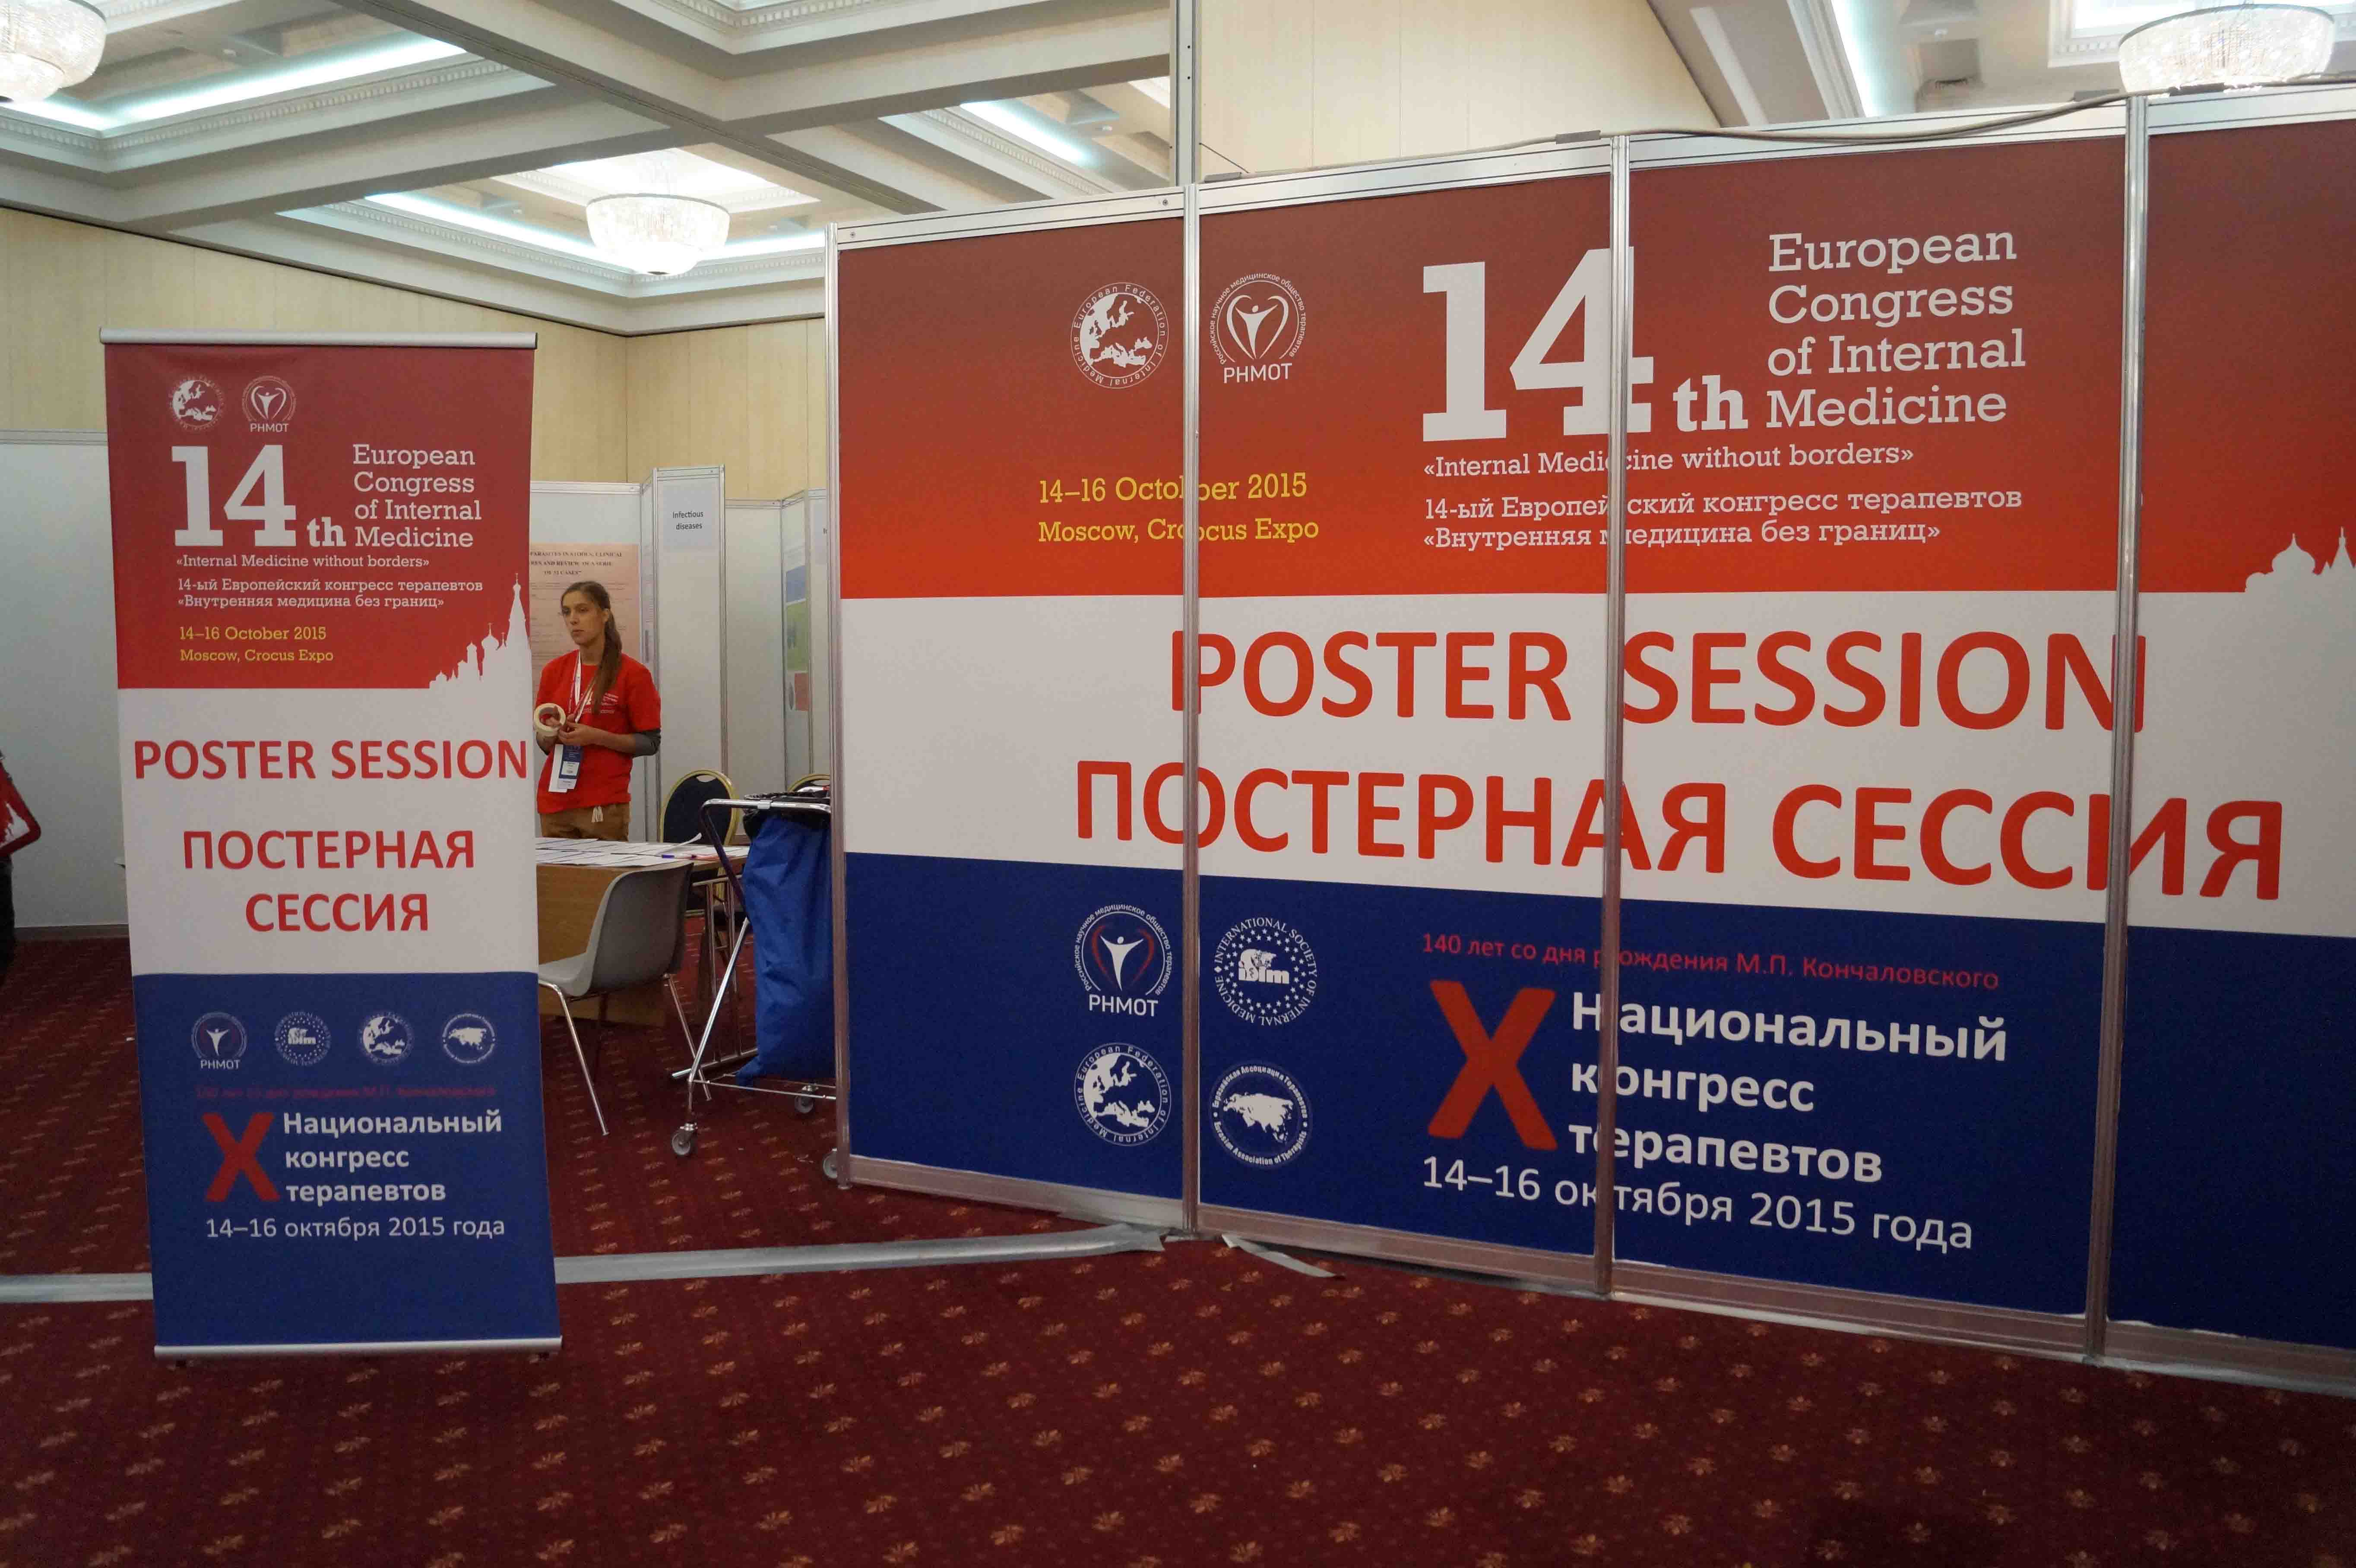 http://medicalexpress.ru/uploads/reportss/0000002.jpg